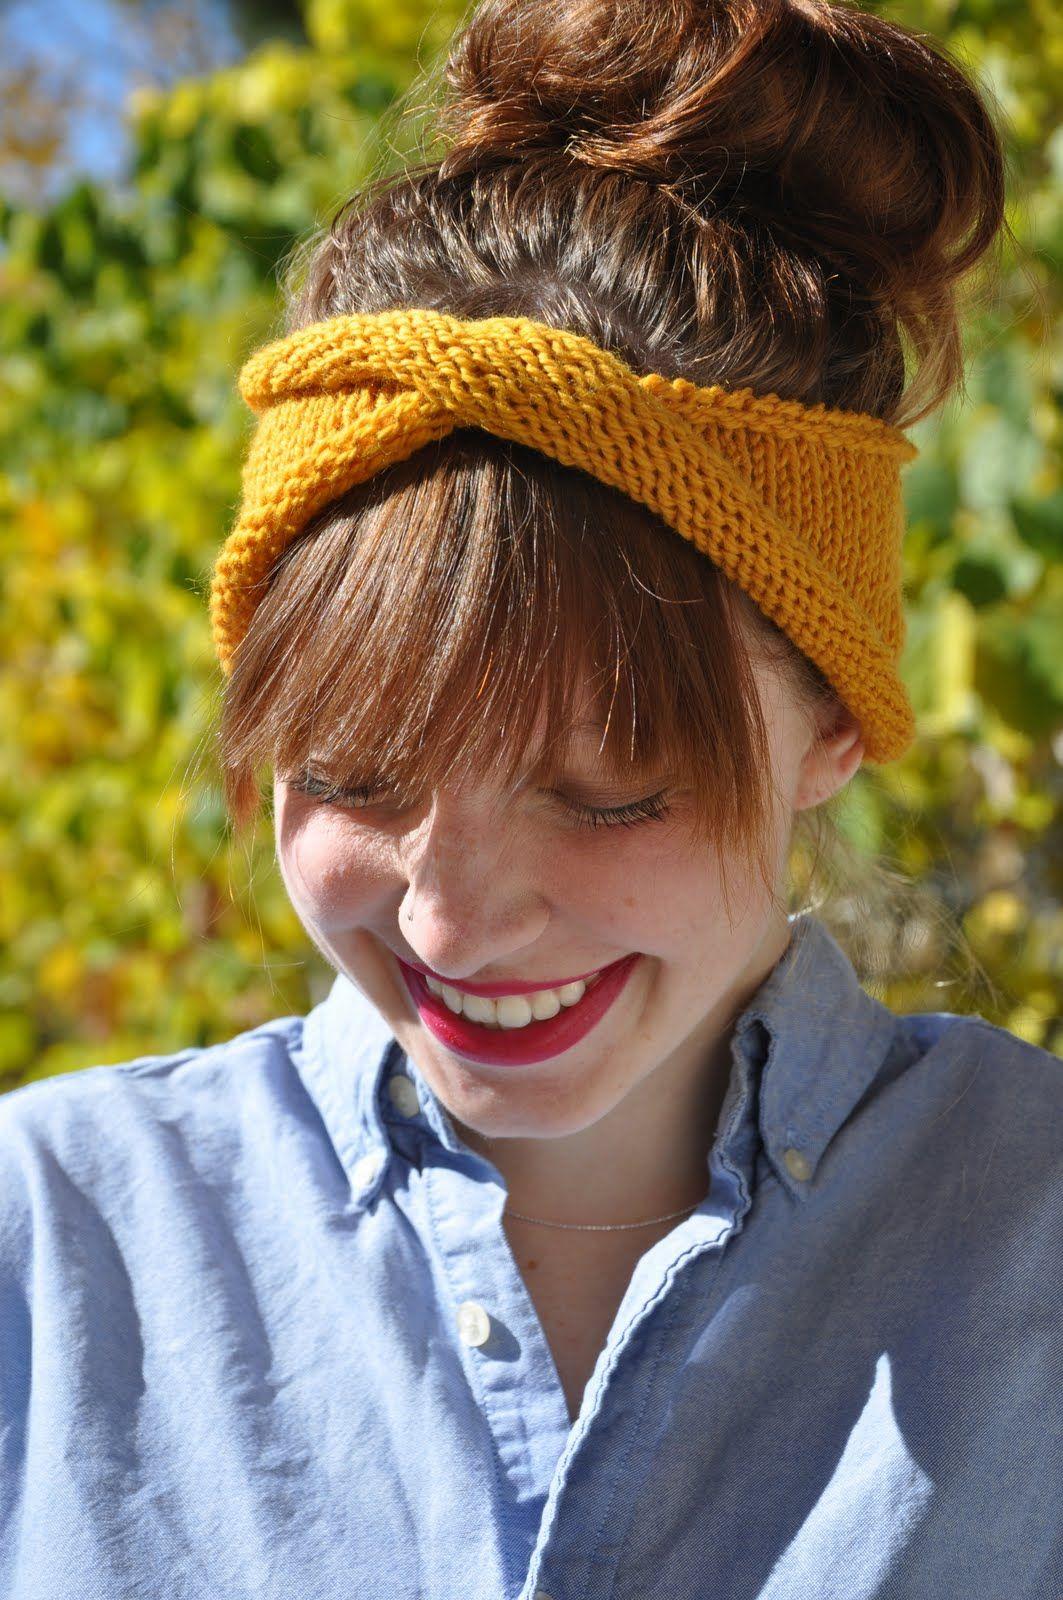 Sans limites crochet the twisty rolly headband free knit sans limites crochet the twisty rolly headband what do you think effy the twisty rolly headband super easy free knit pattern bankloansurffo Images